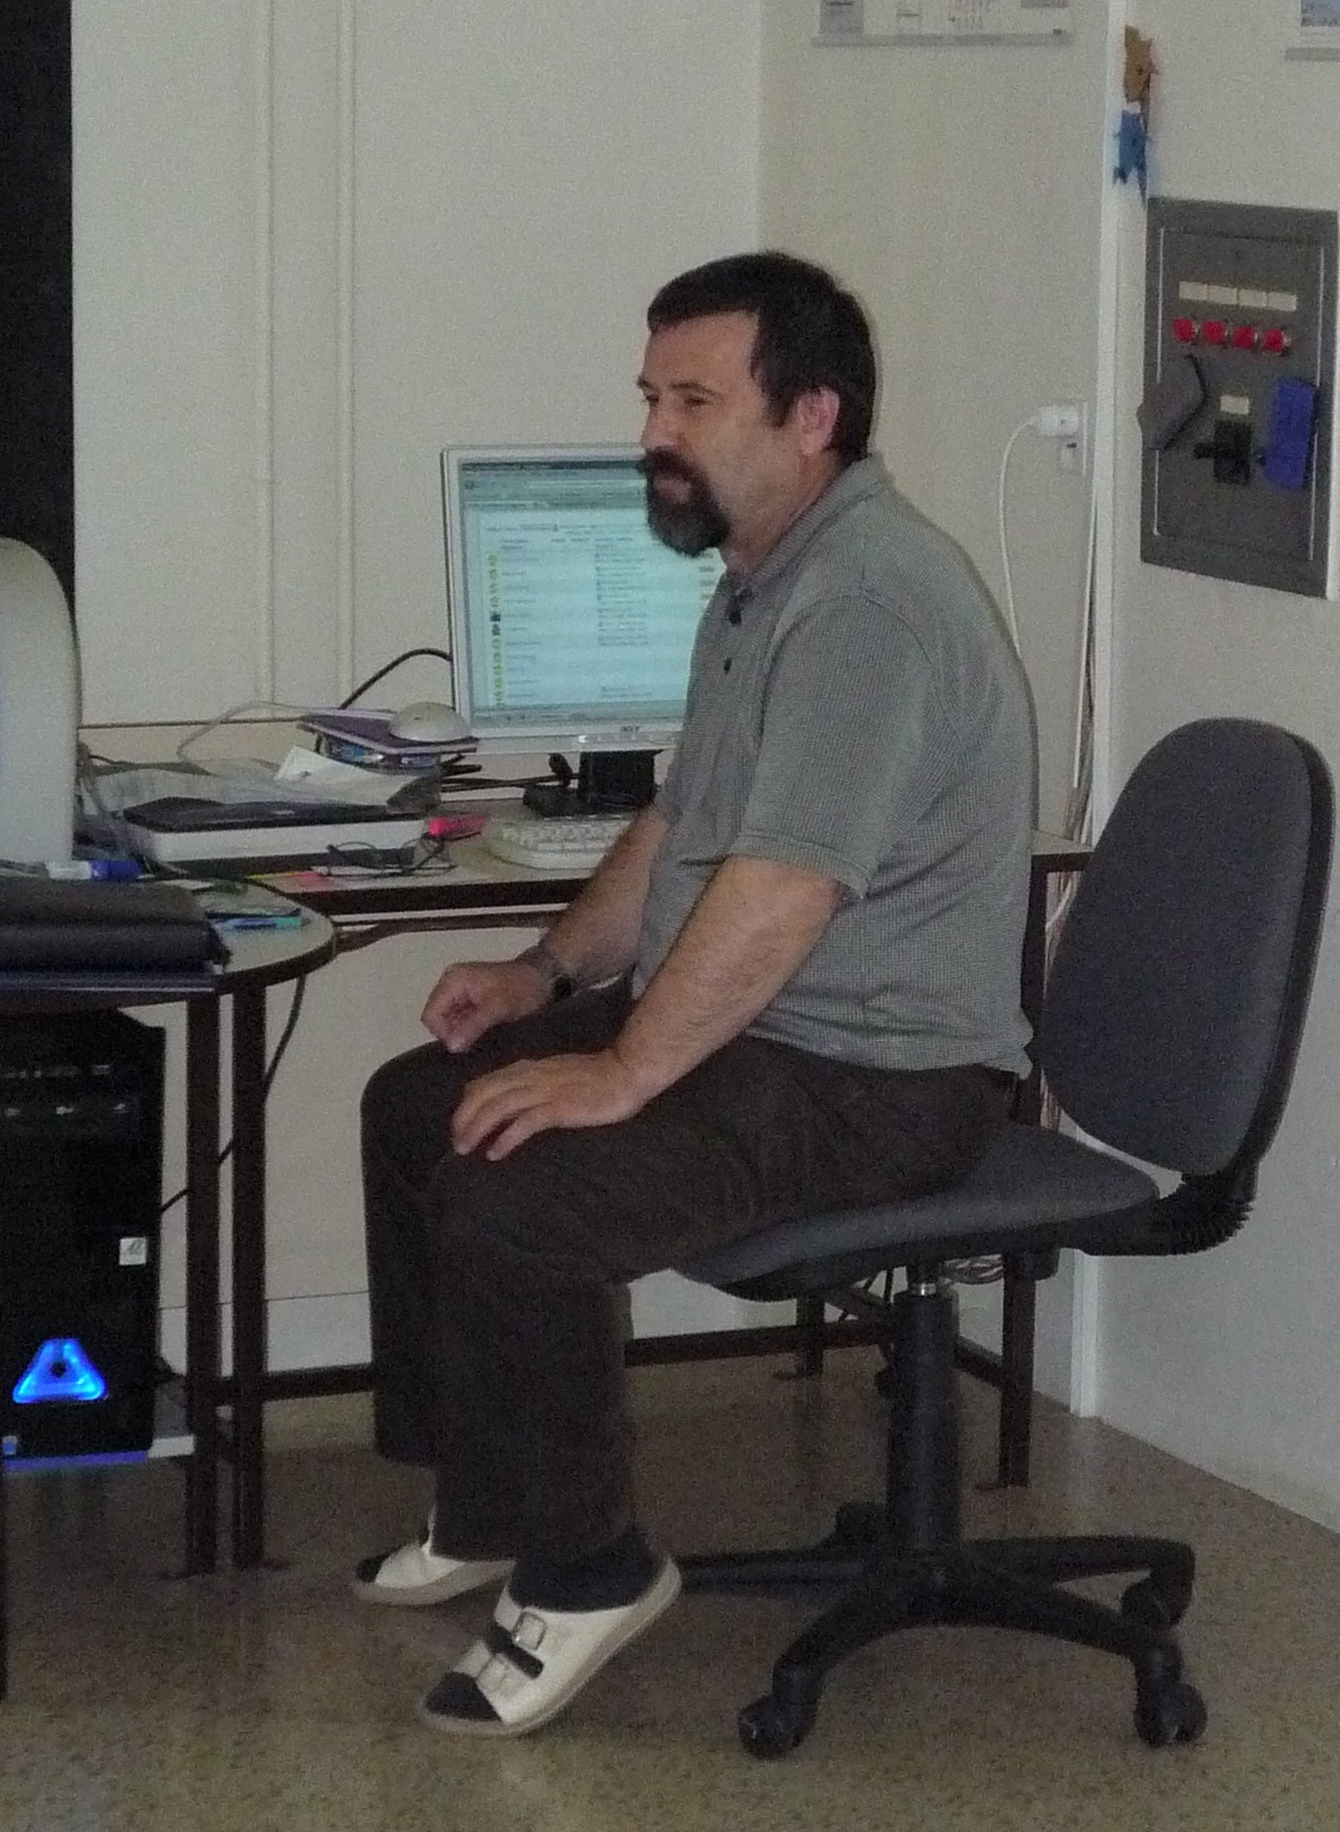 Vedoucí kabinetu IVT Ing. Ladislav Lór u katedry